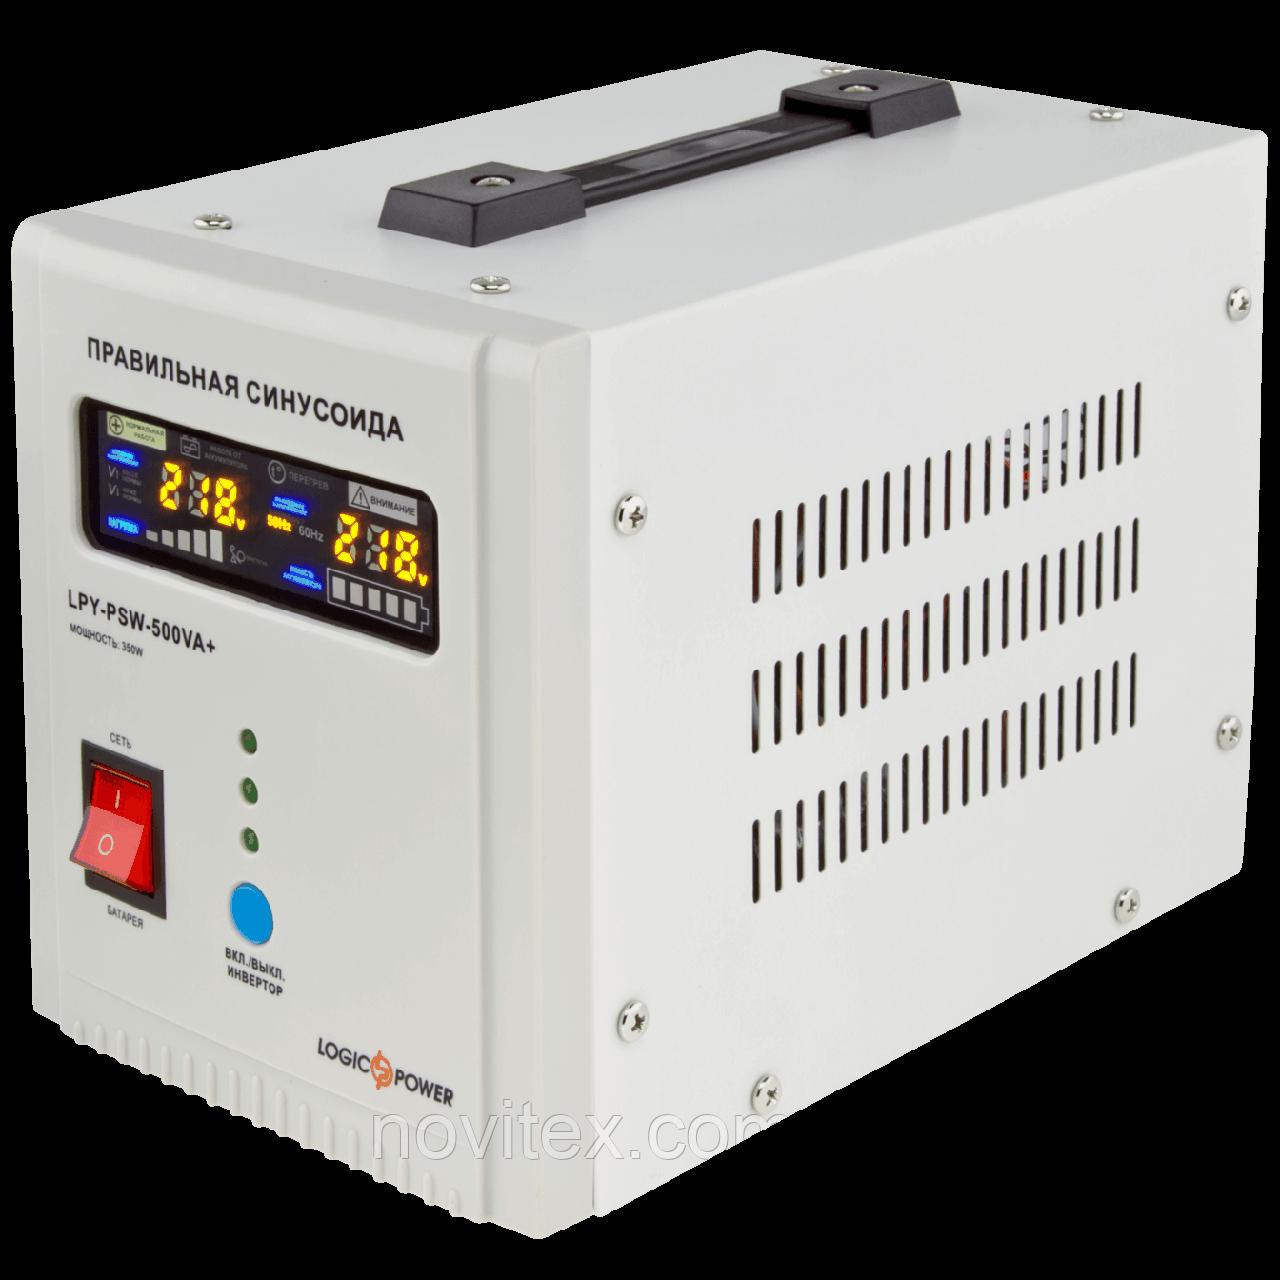 ИБП Logicpower LPY-PSW-500 (350Вт)